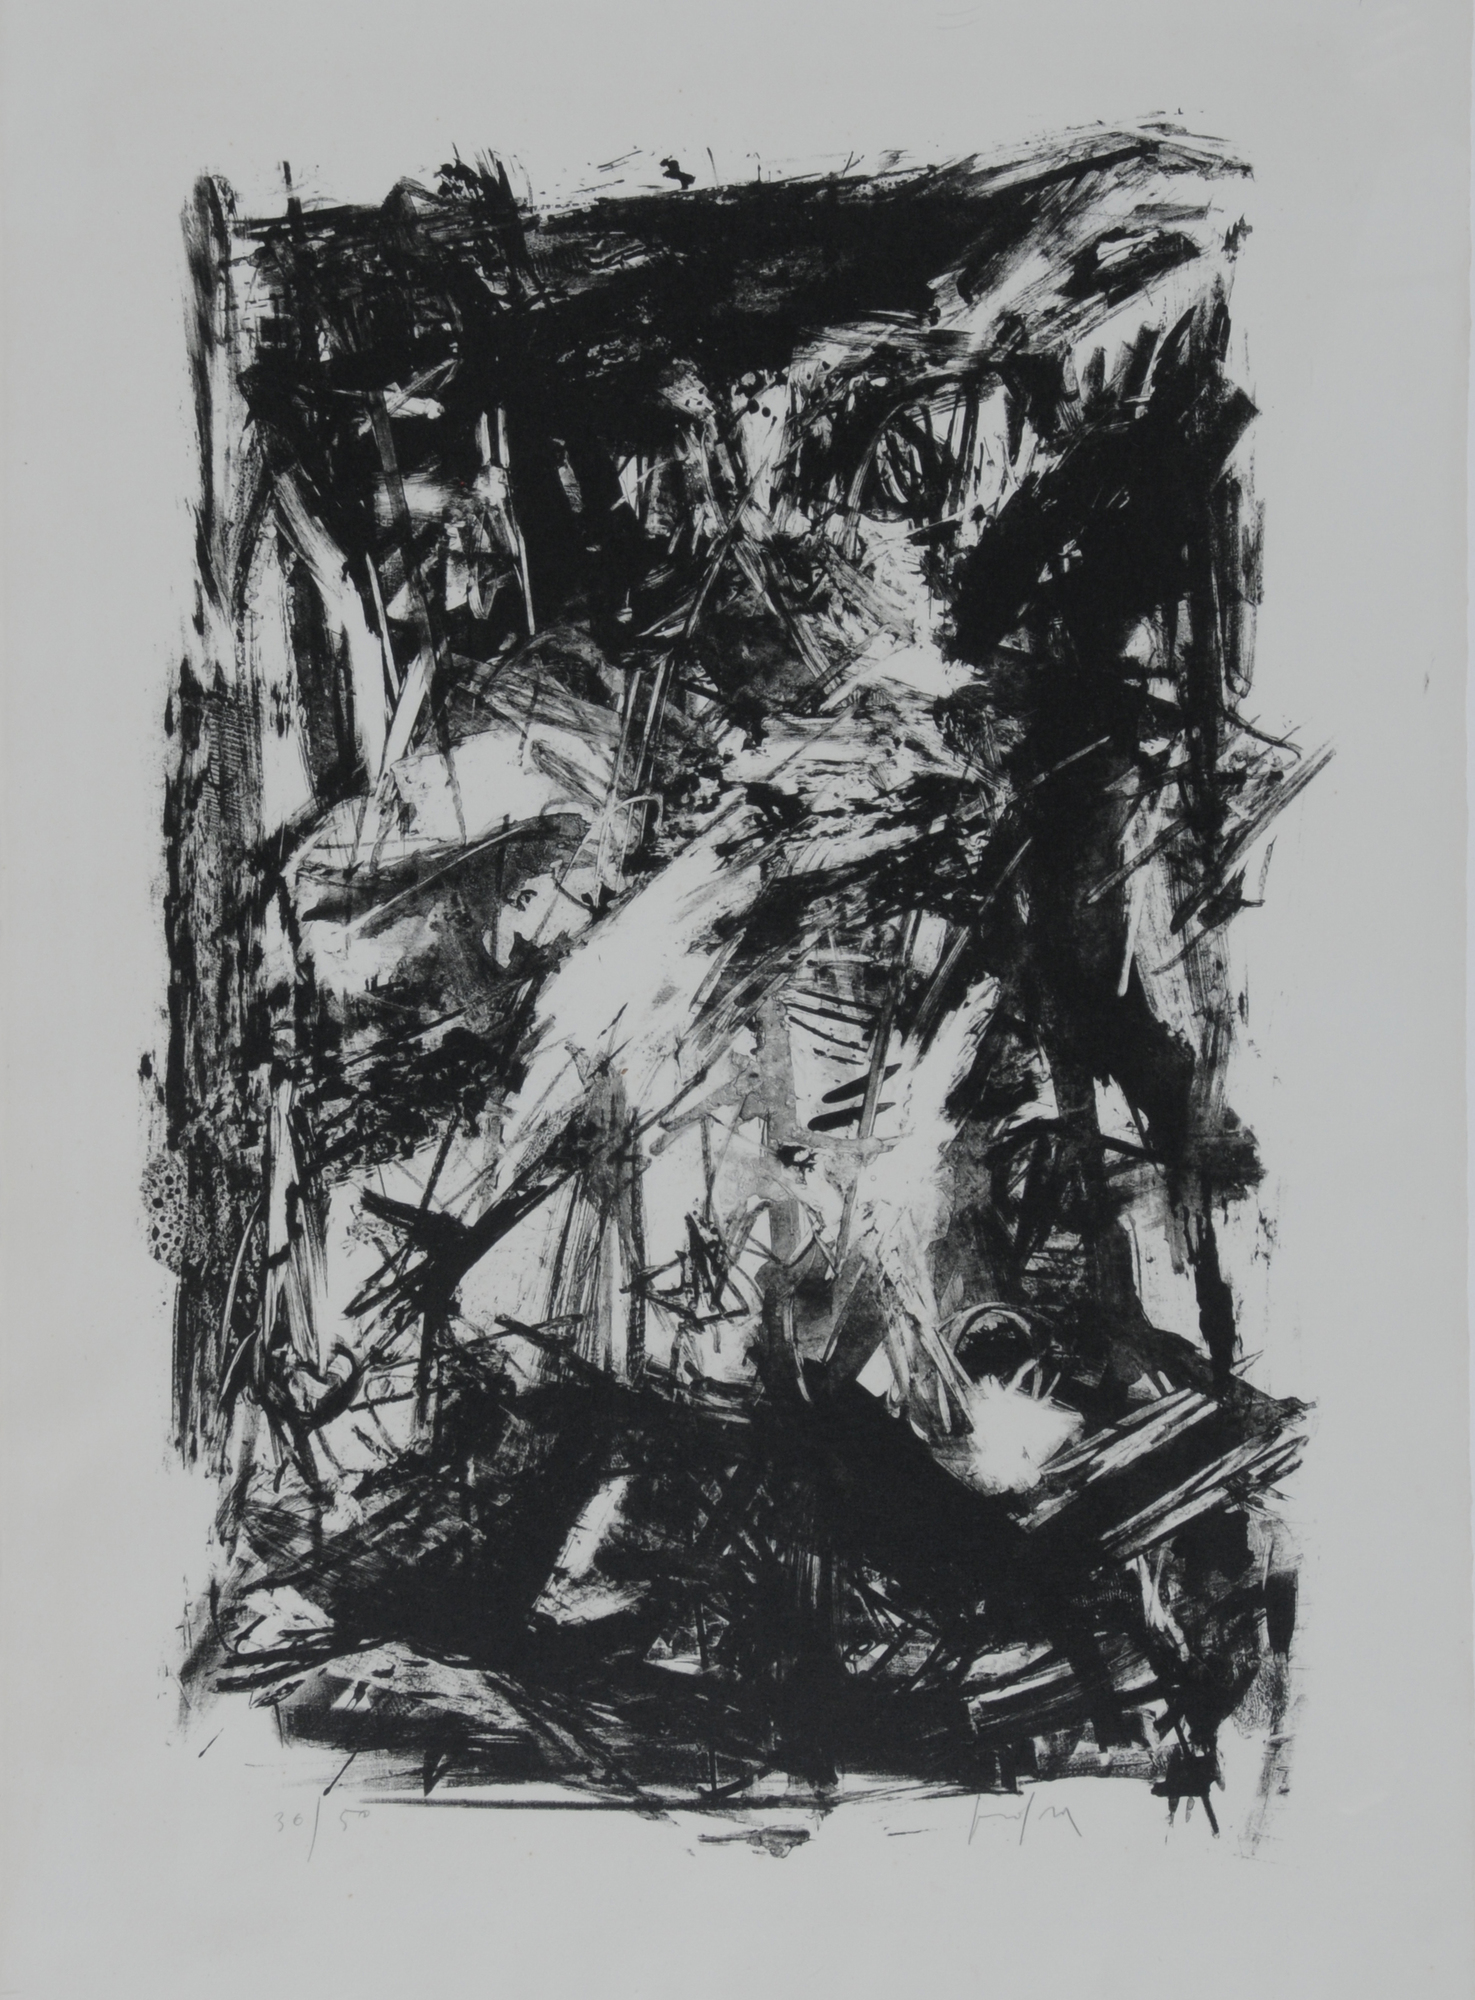 Vedova Emilio, Untitled